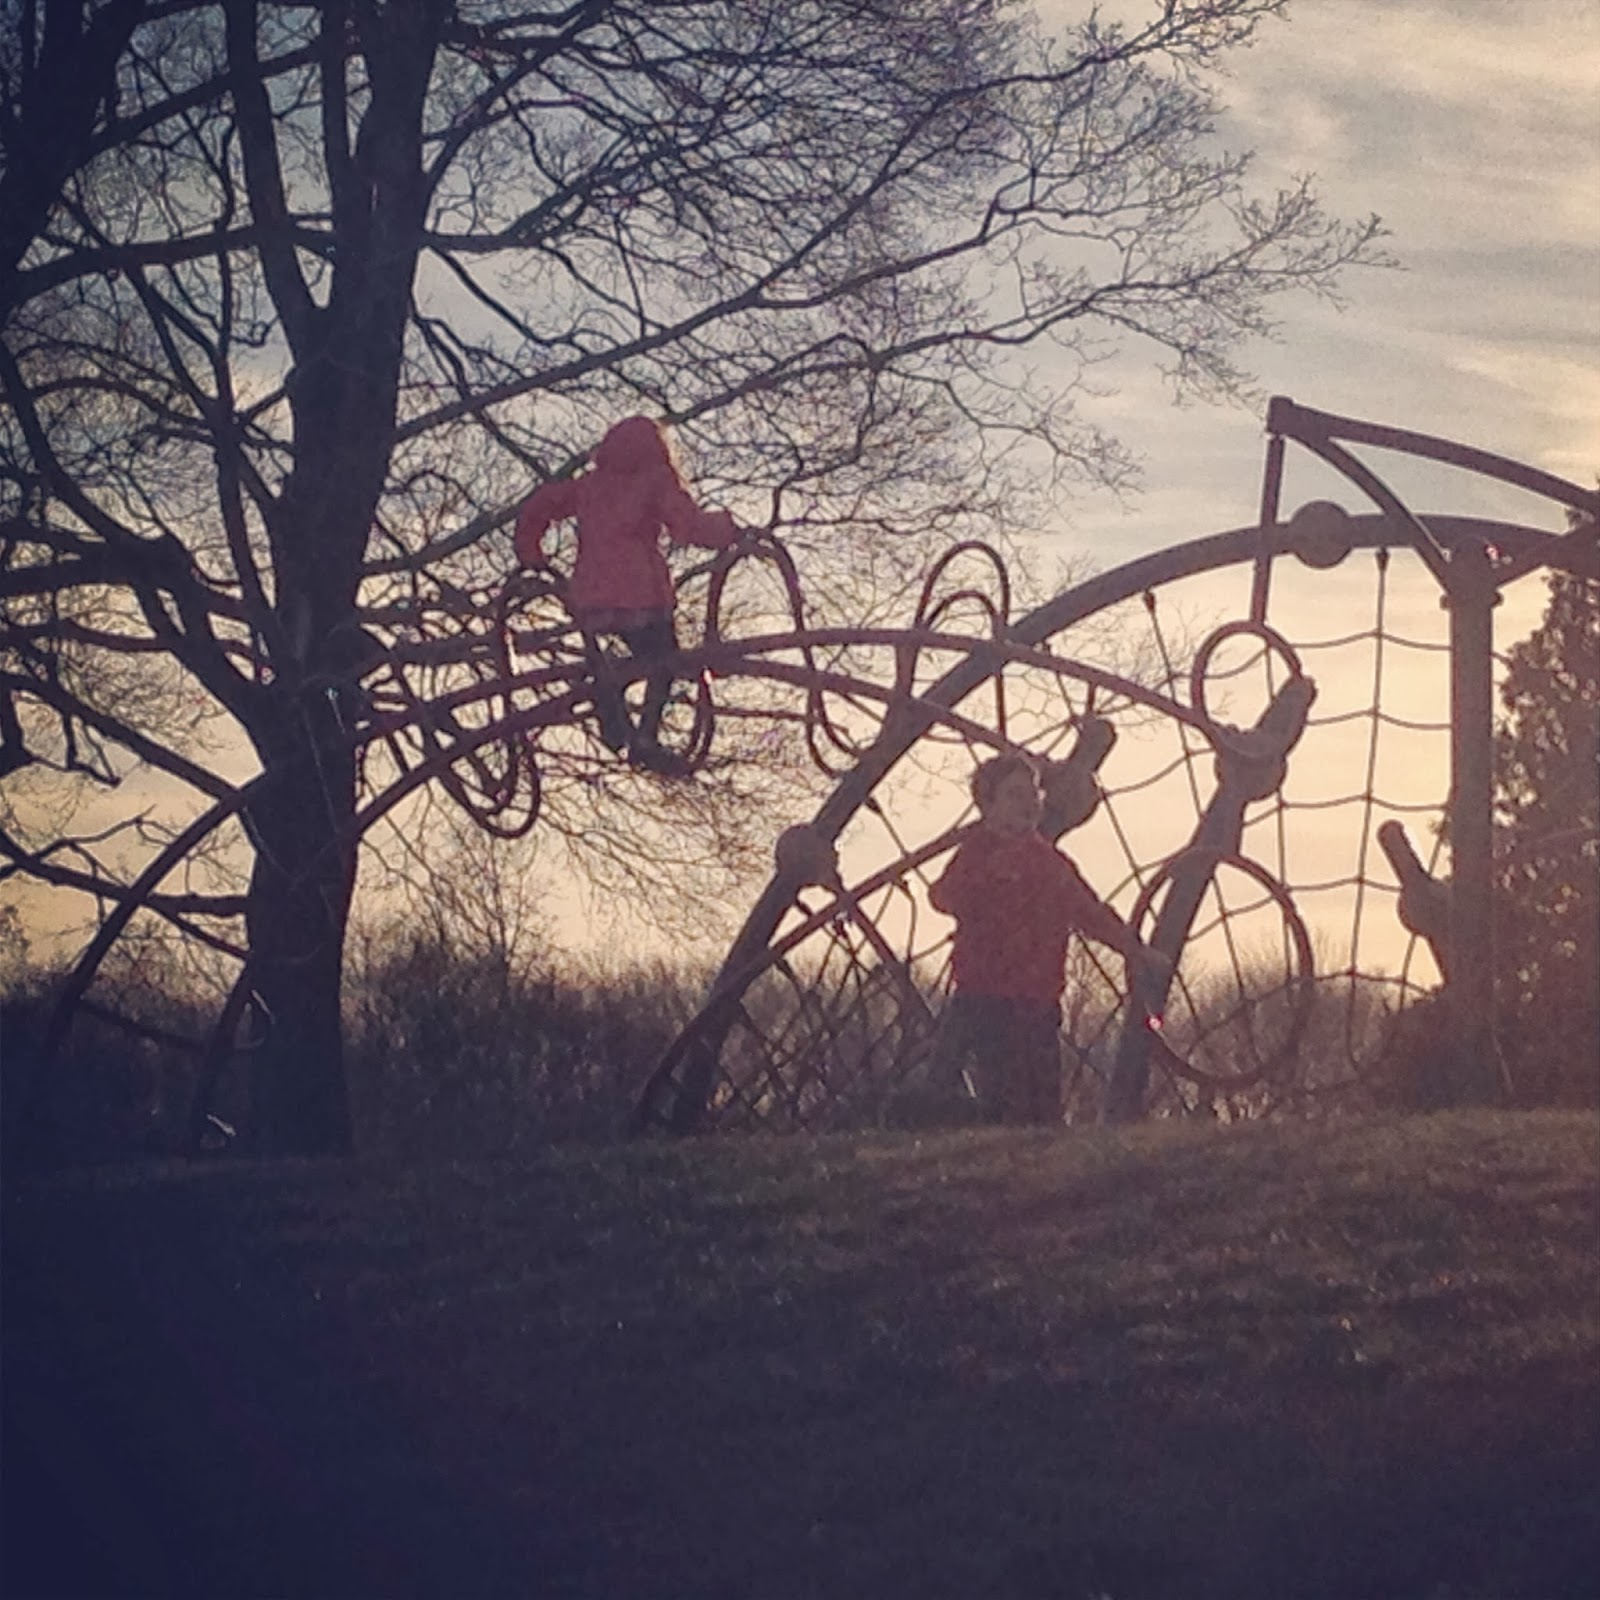 Playground - Flotsam of the Mind